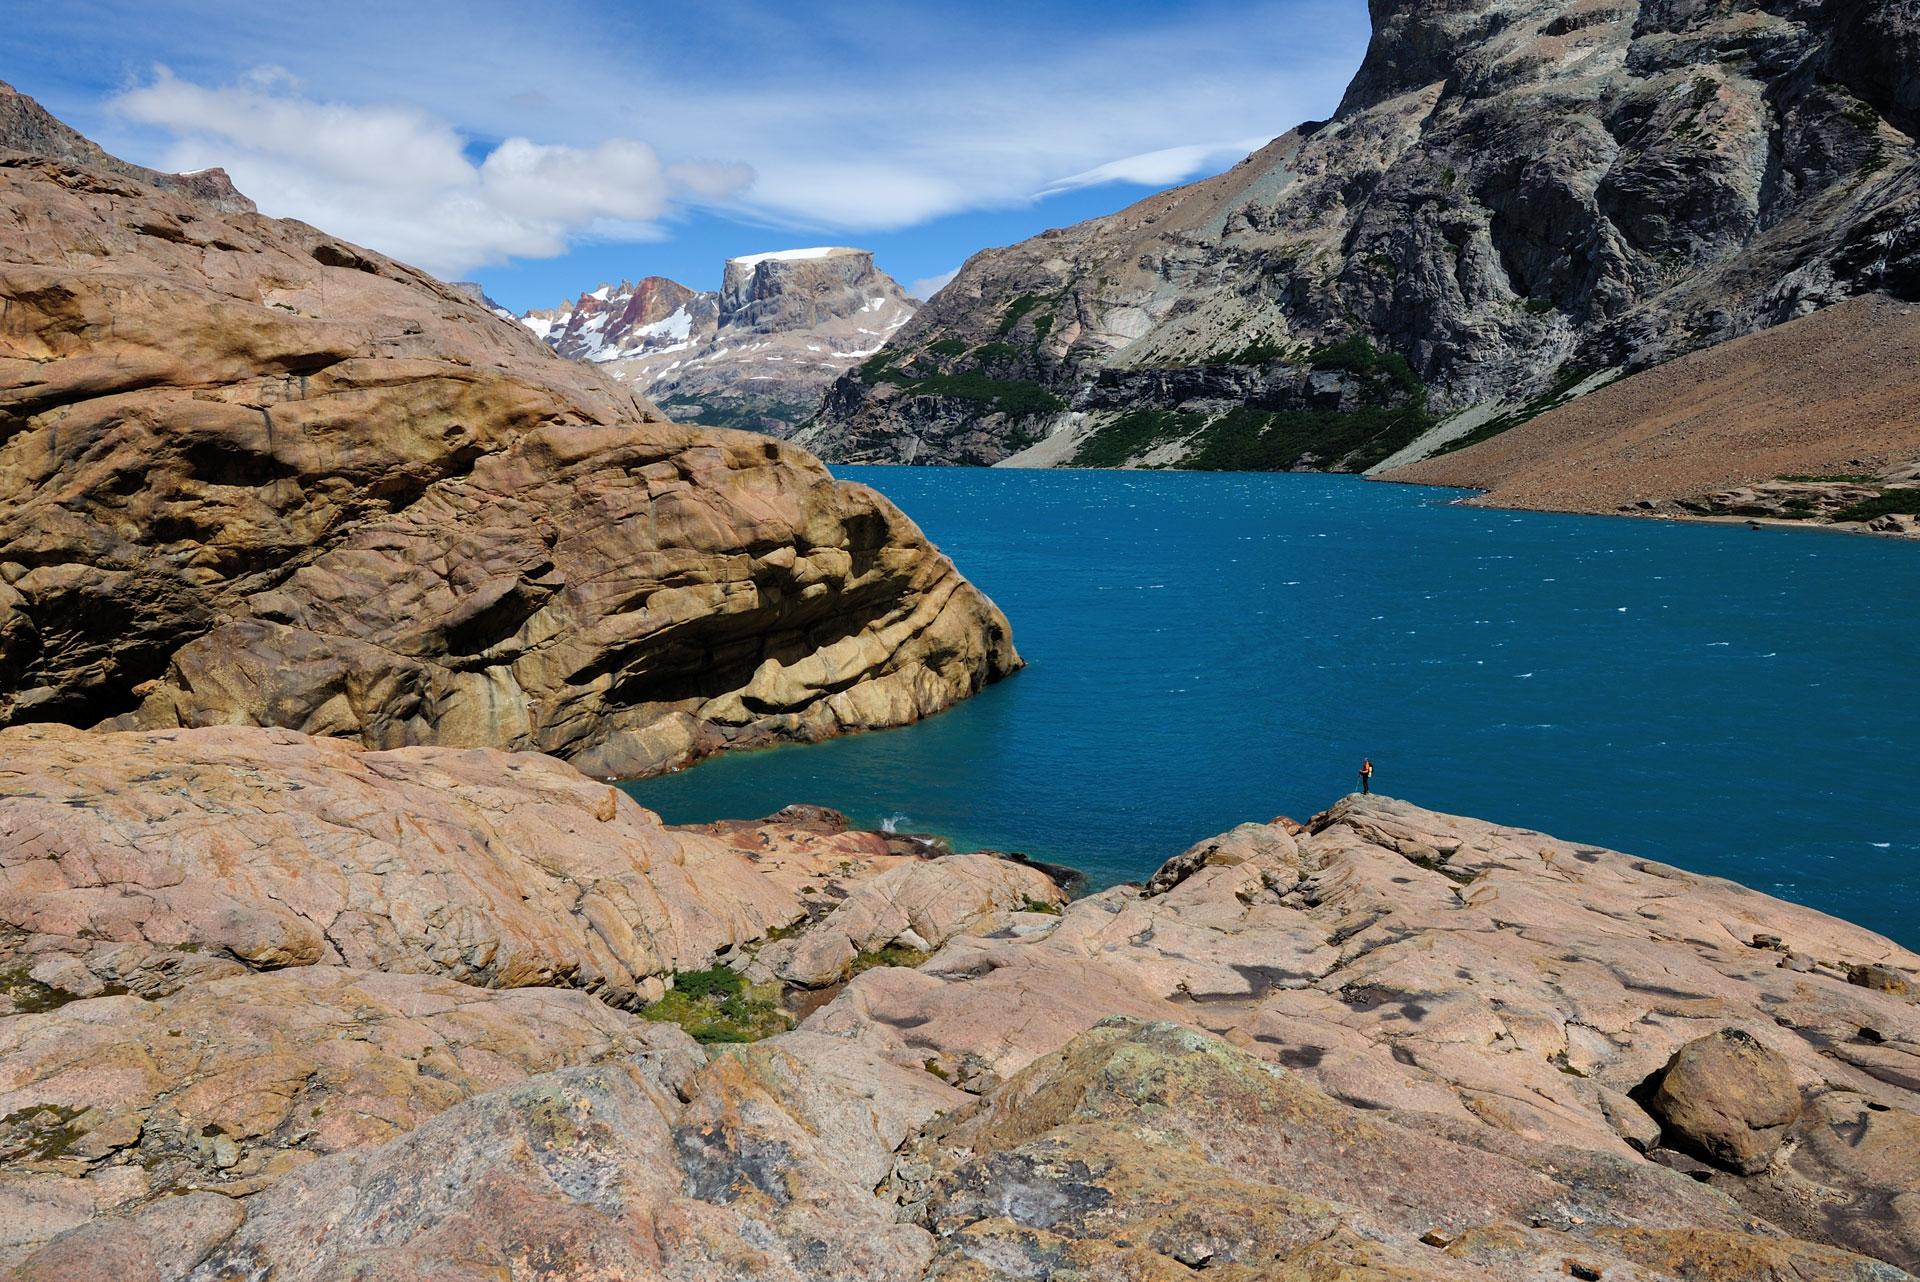 VAUDE-Visions-Wallpapers-for-free-Laguna-Azul-the-blue-lagoon-Patagonia-wallpaper-wp48011658